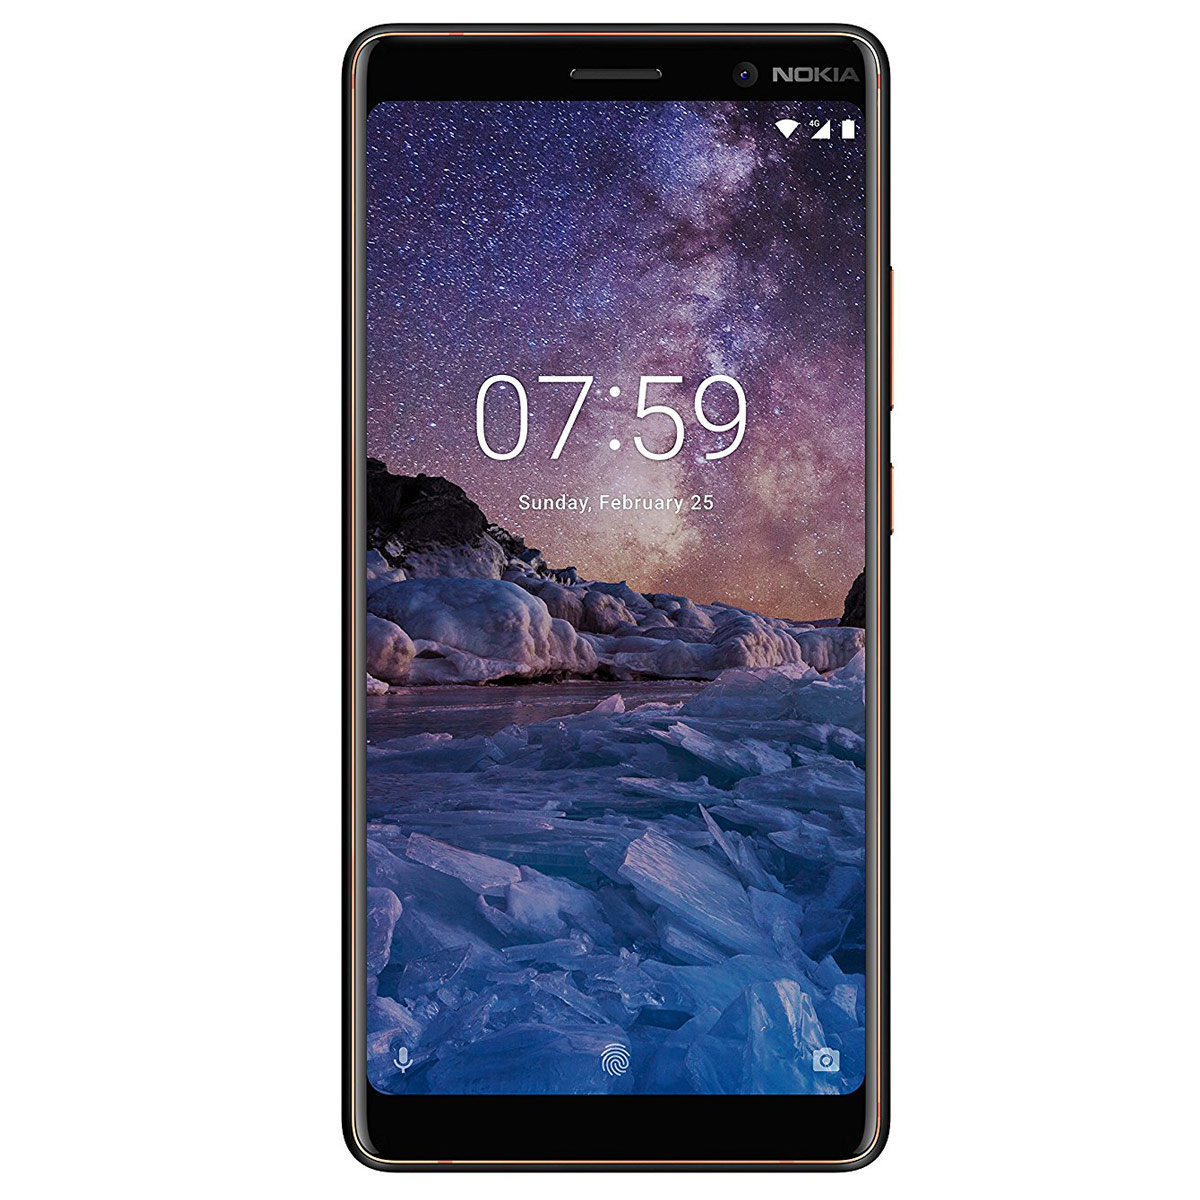 "Mobile & smartphone Nokia 7 plus Noir Smartphone 4G-LTE Advanced Dual Sim - Snapdragon 660 8-core 2.2 GHz - RAM 4 Go - Ecran tactile 6"" 1080 x 2160 - 64 Go - NFC/Bluetooth 5.0 - 3800 mAh - Android 8.0"